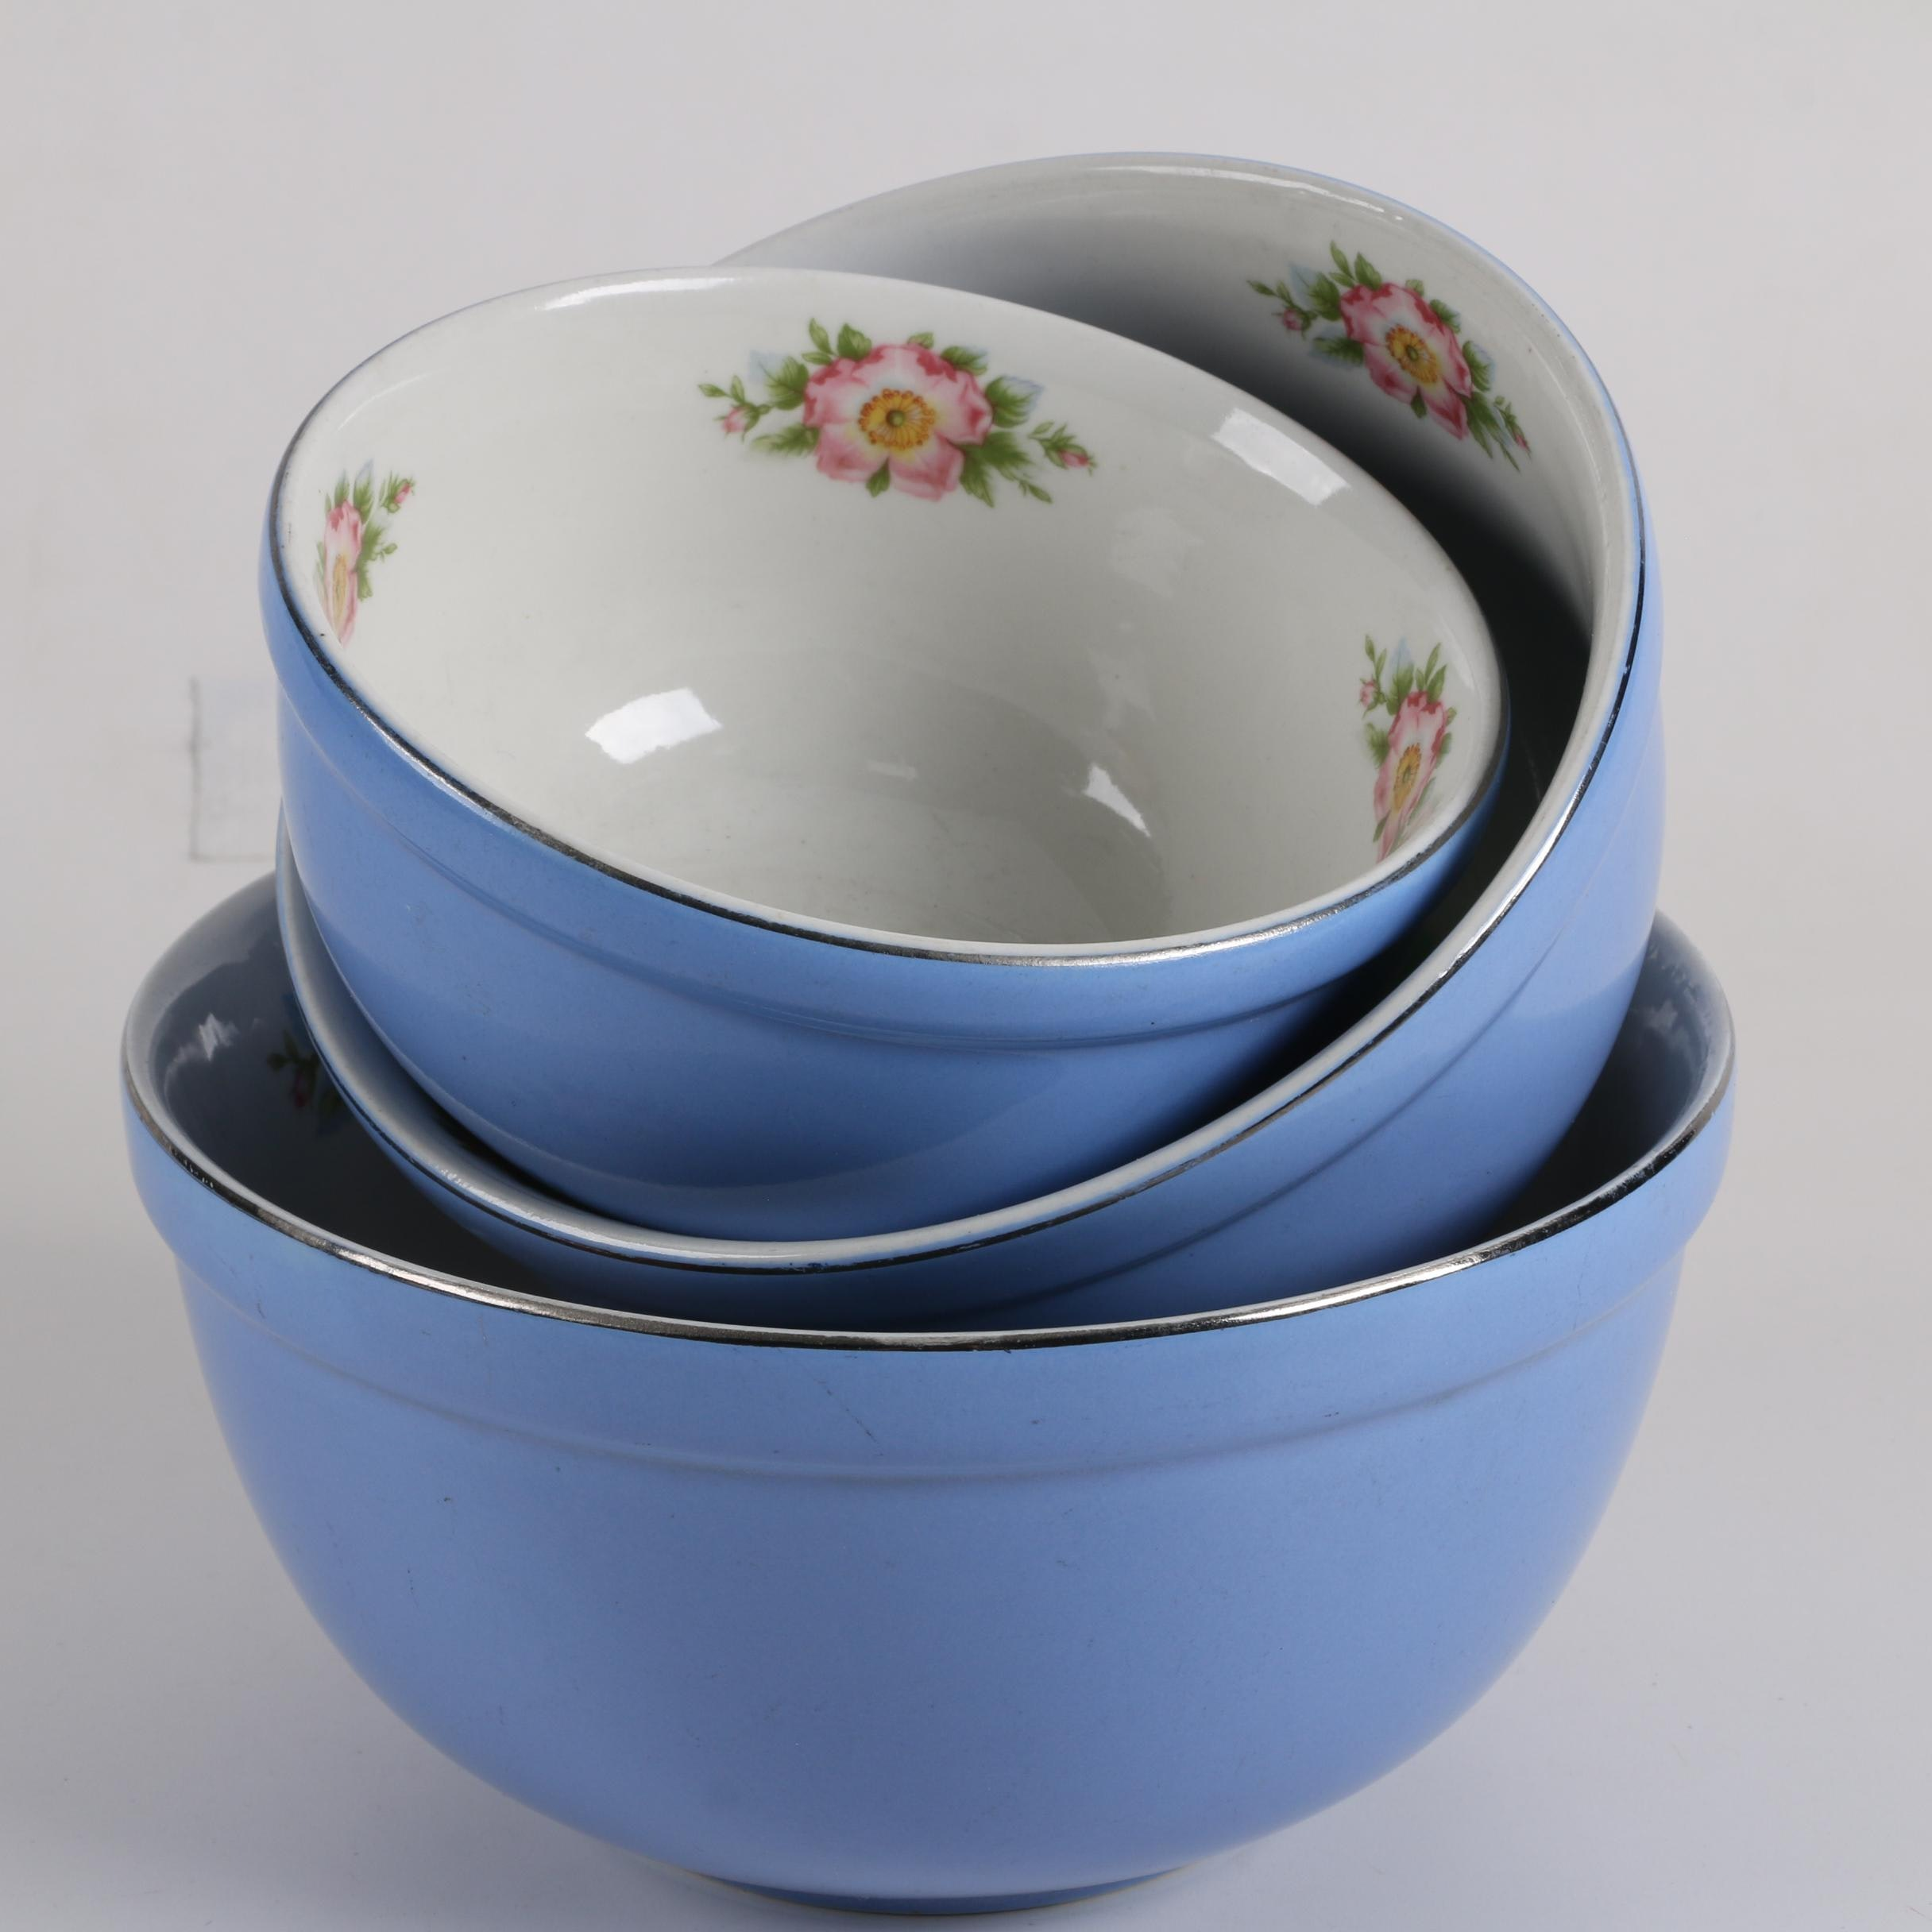 Vintage Hall\u0027s \ Superior Kitchenware\ Nesting Mixing Bowls ... & Vintage Hall\u0027s \